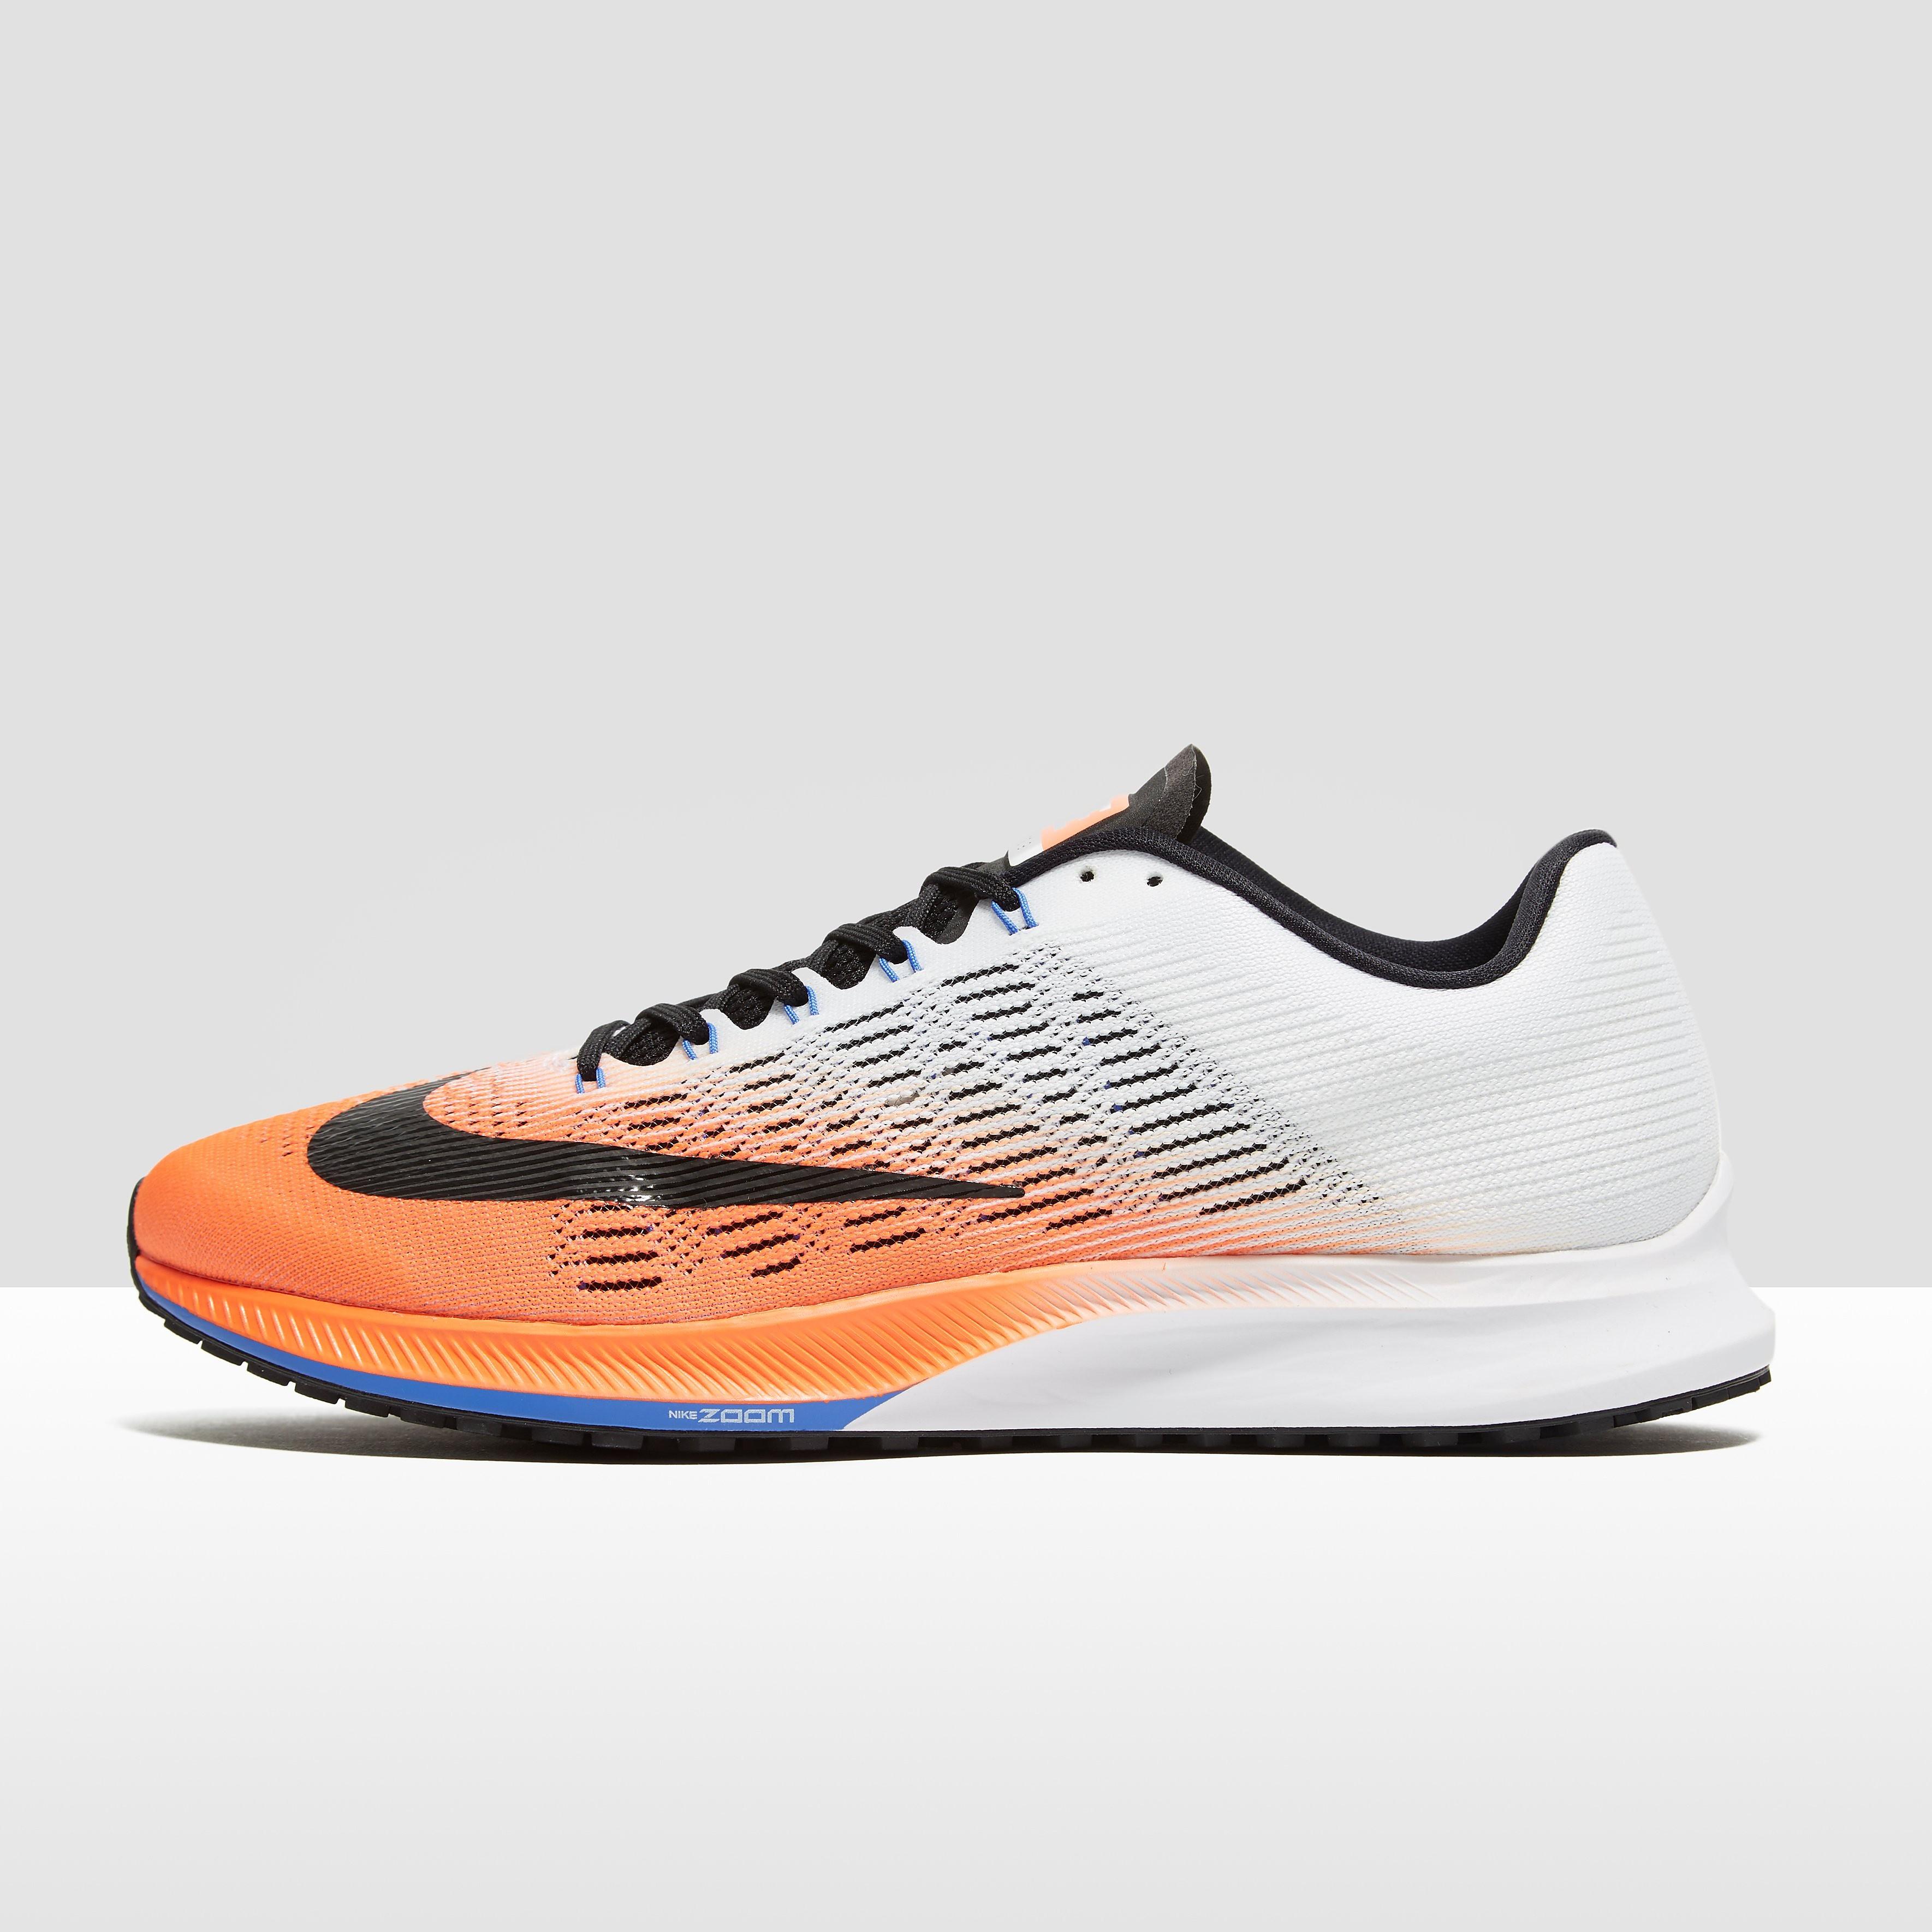 Nike Air Zoom Elite 9 Men's Running Shoes